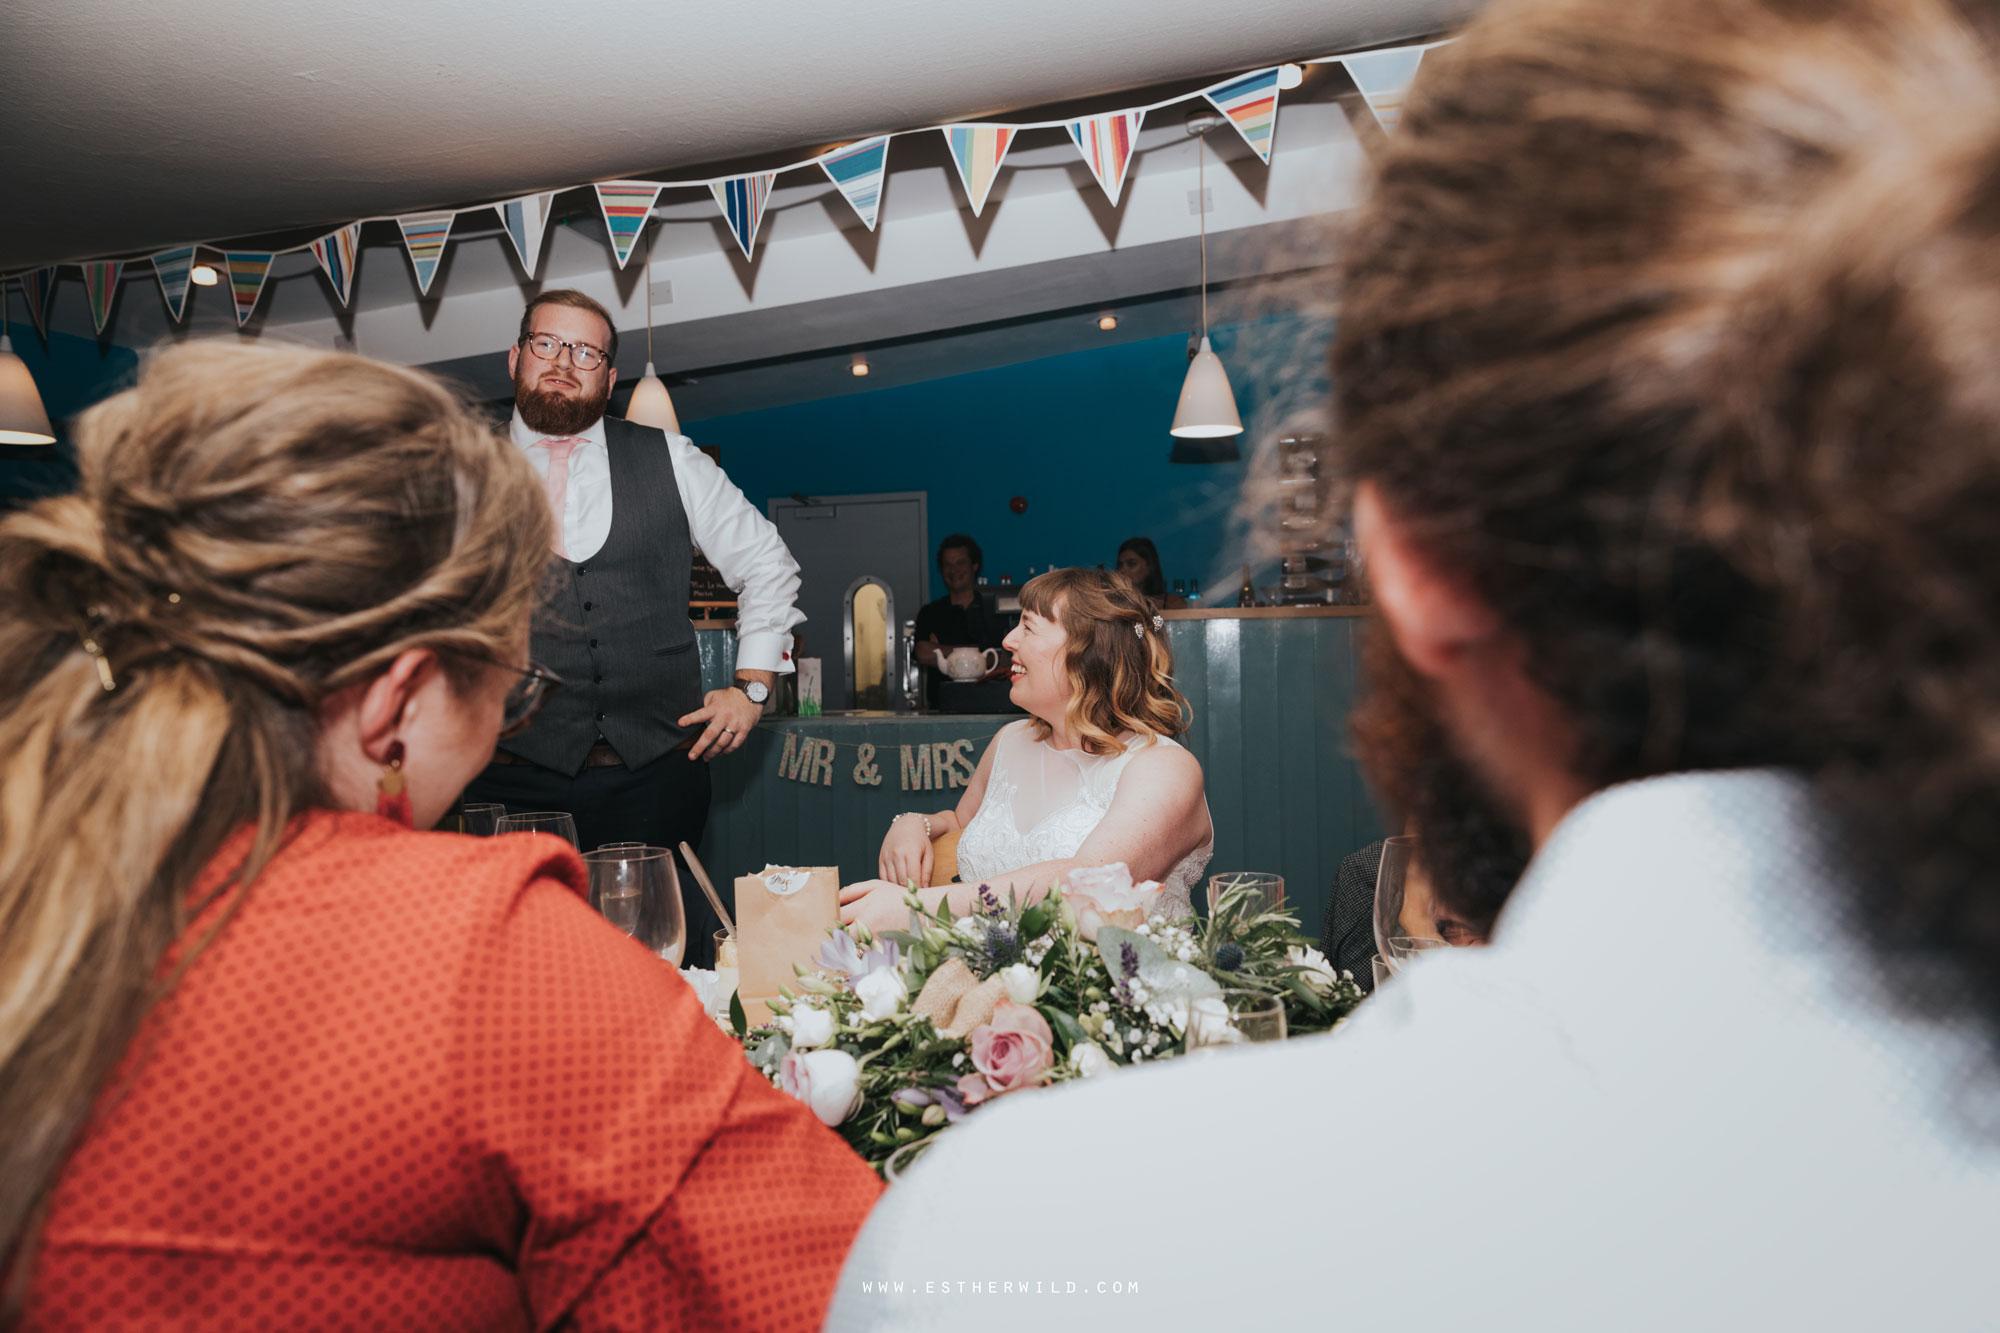 Cromer_Wedding_Beach_Outdoor_Ceremony_Norfolk_North_Lodge_Registry_Office_Rocket_House_Cafe_Cromer_Pier_IMG_5300.jpg